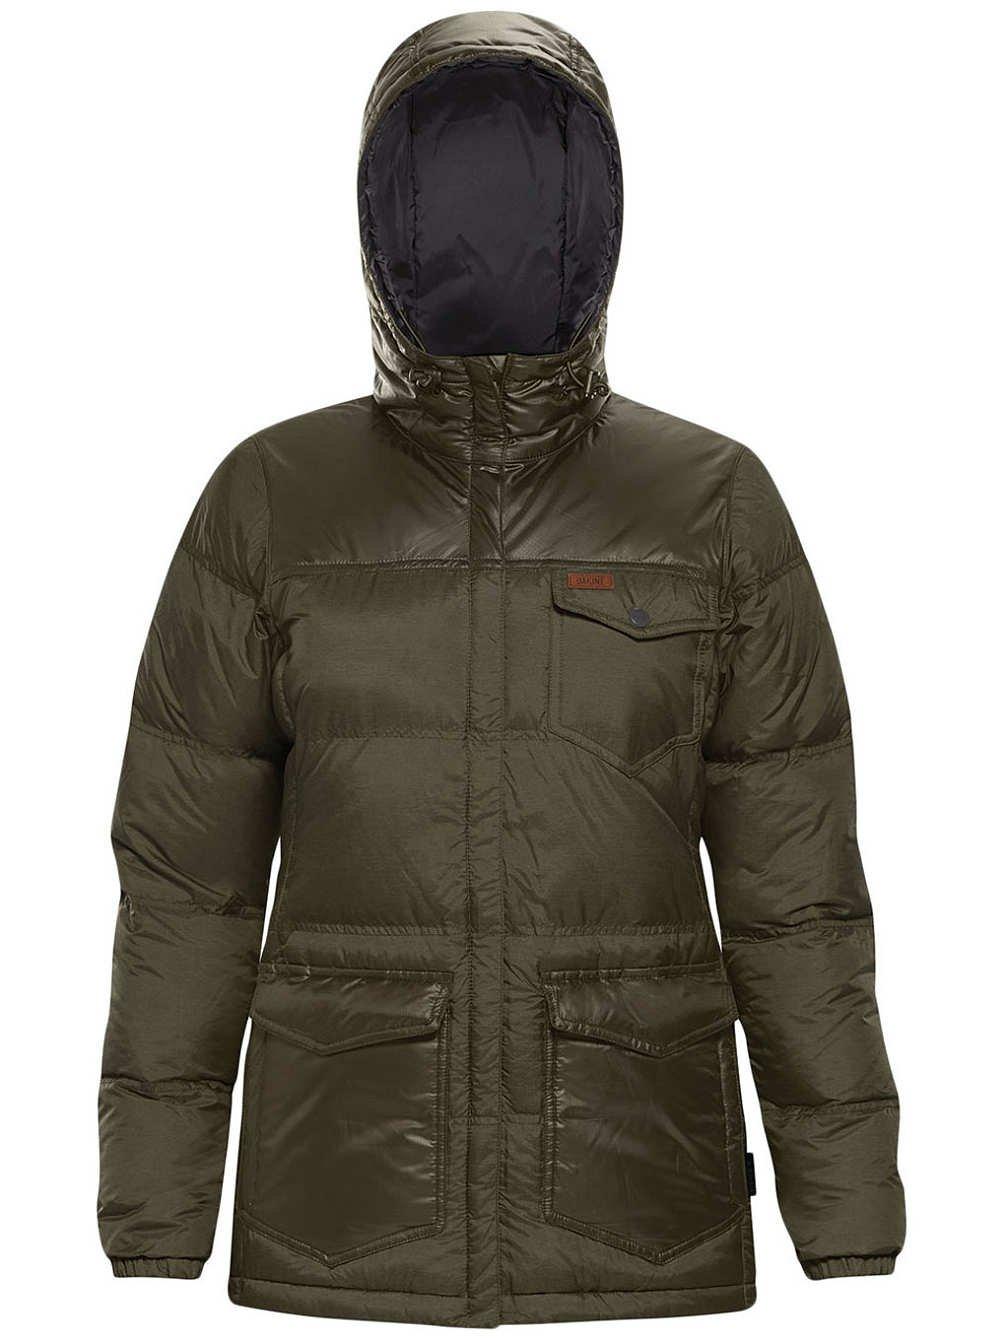 Damen Snowboard Jacke Dakine Lolo Down Jacket jetzt kaufen